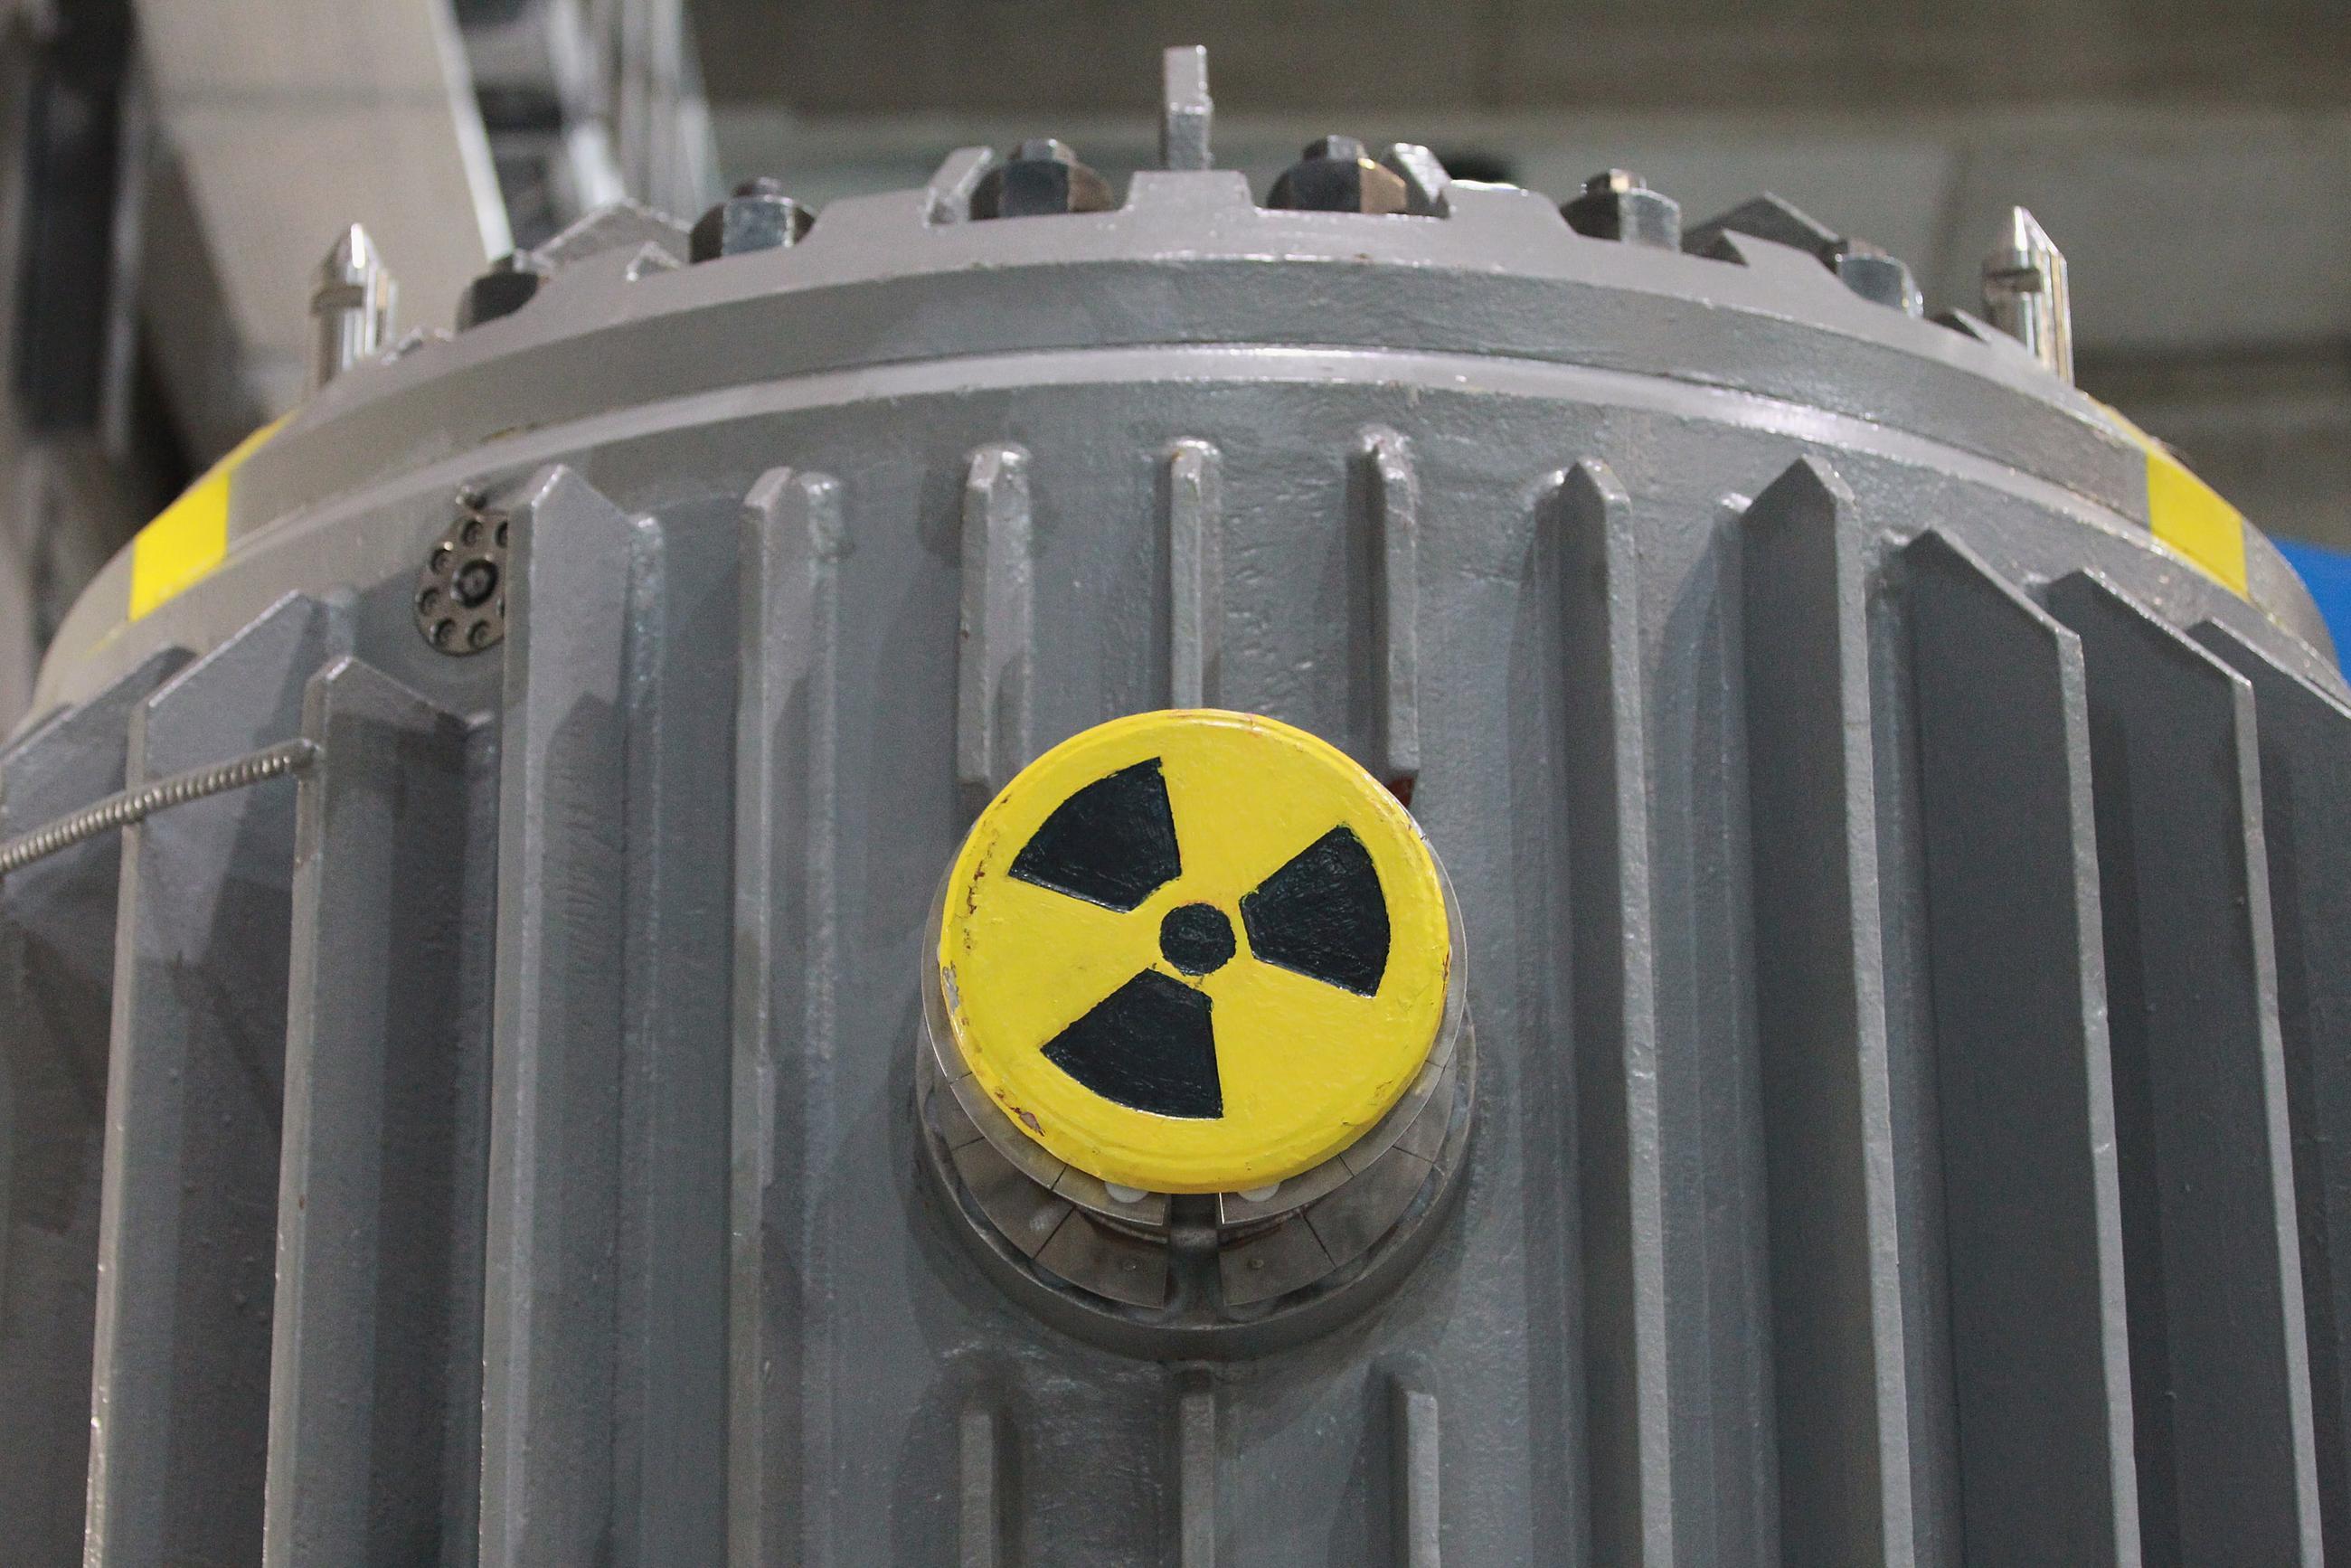 Worker Testing Expands After Radioactive Waste-Dump Leak